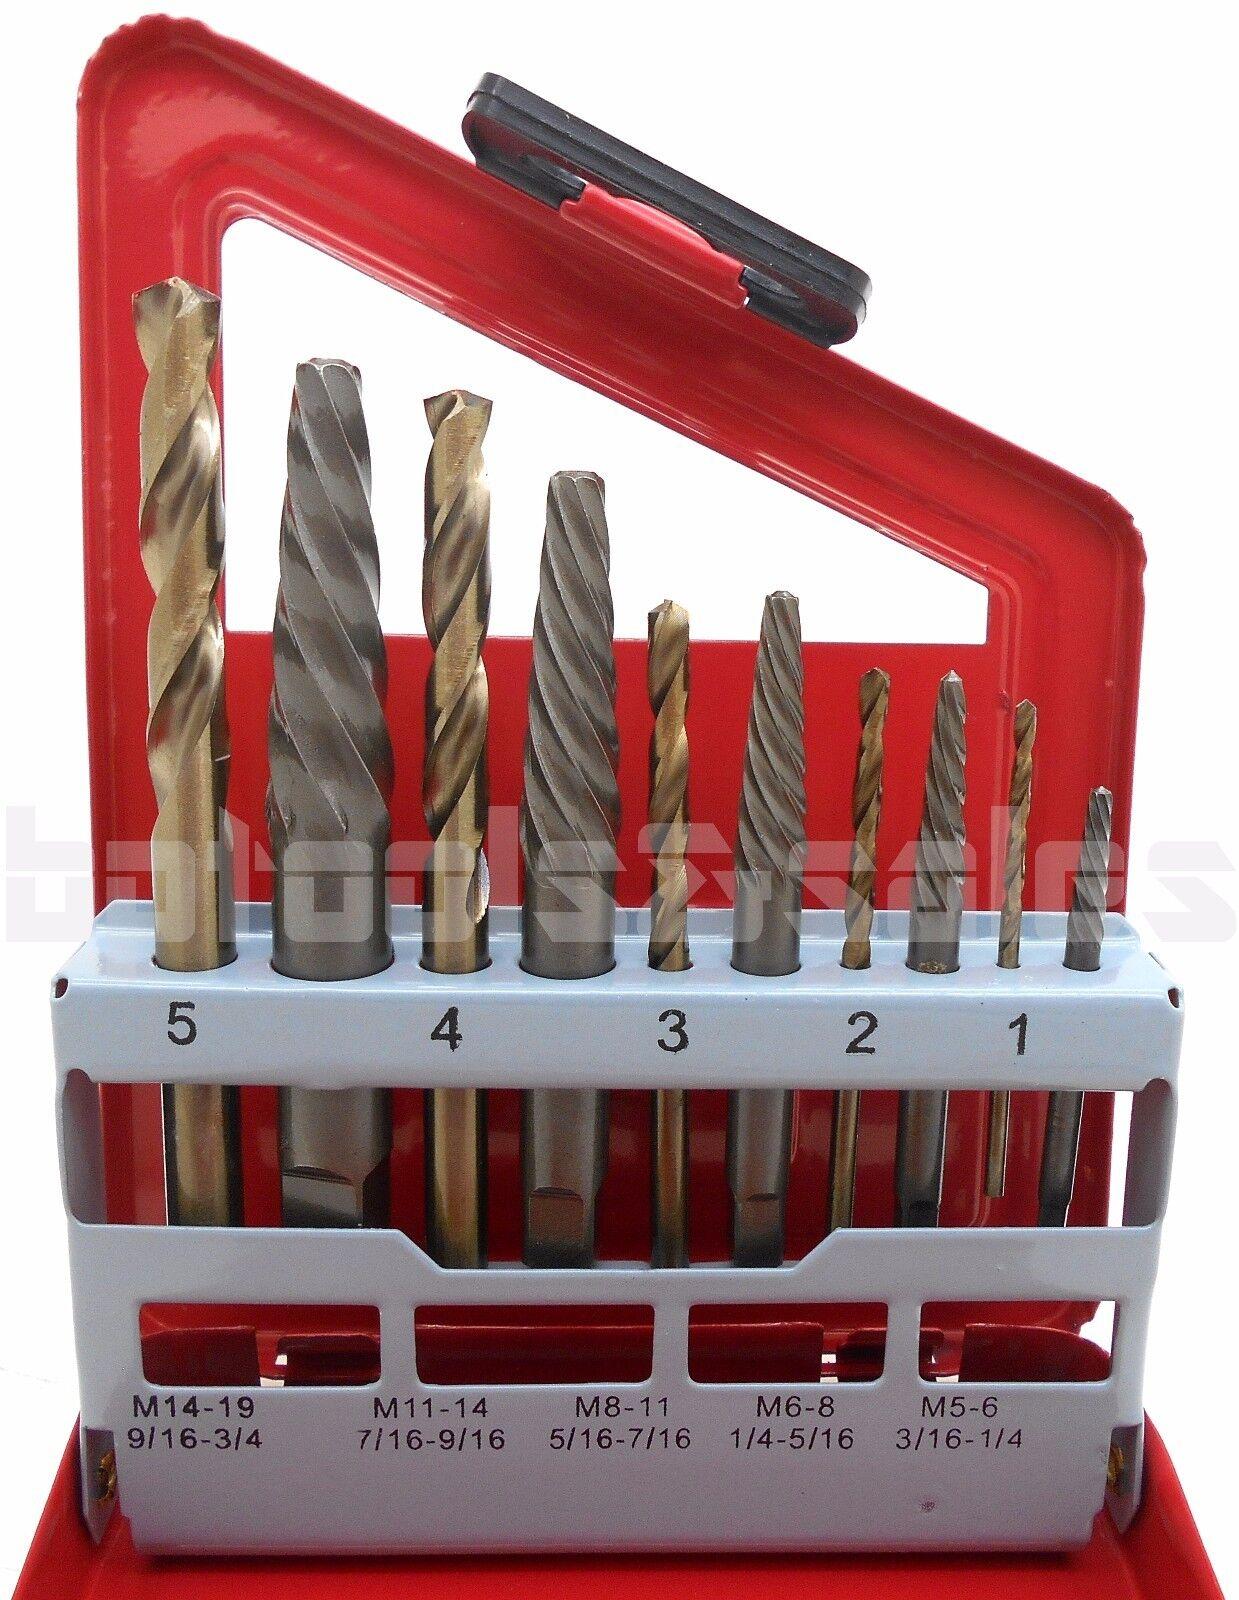 screw extractor right drill bit